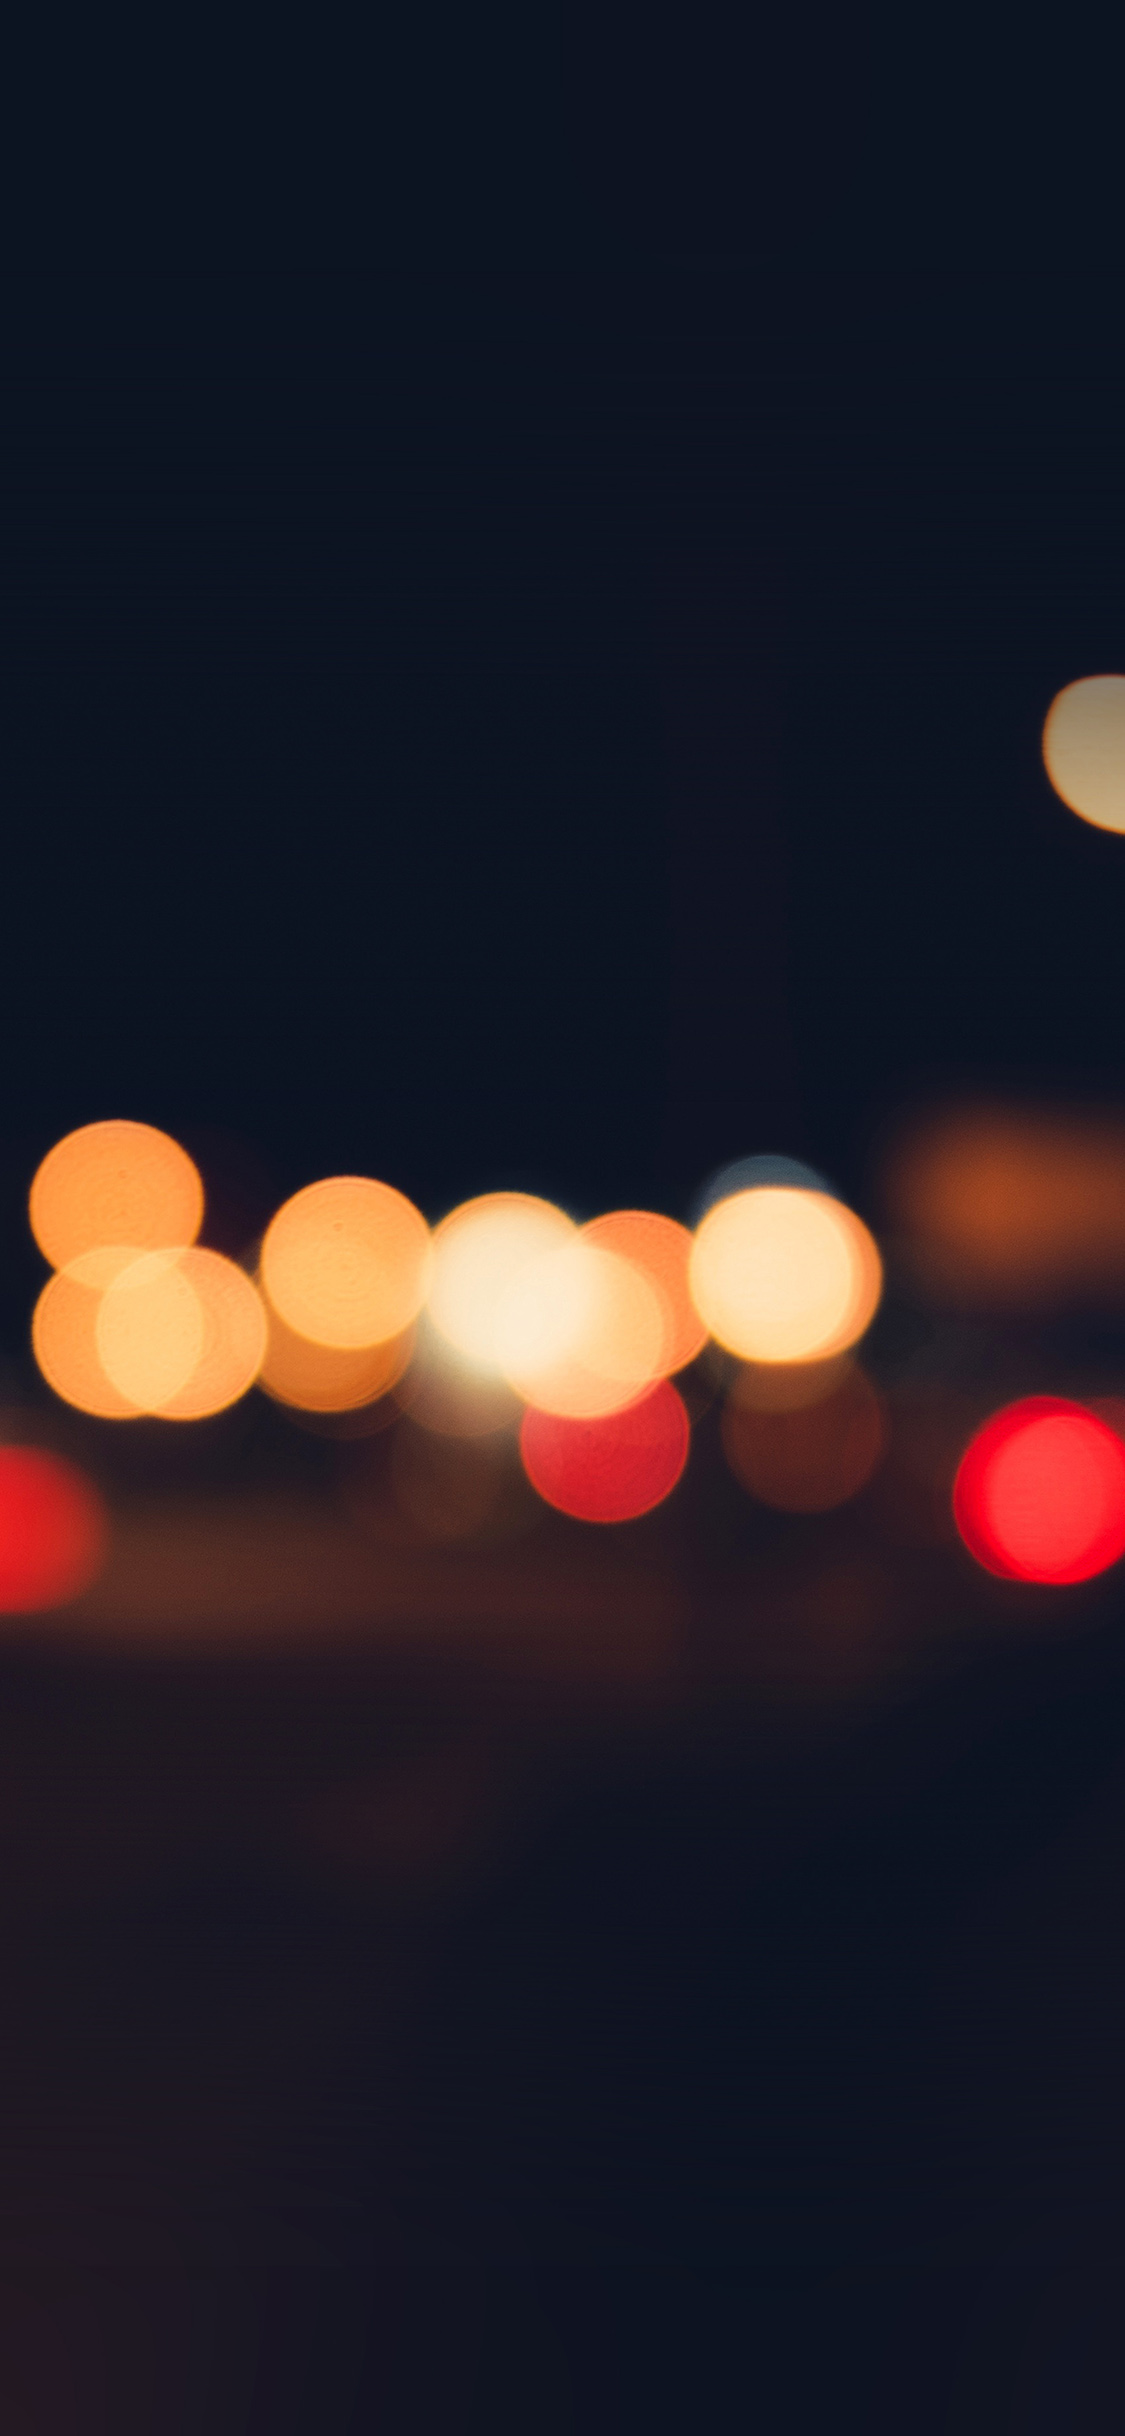 iPhoneXpapers.com-Apple-iPhone-wallpaper-mx01-bokeh-dark-lights-night-art-simple